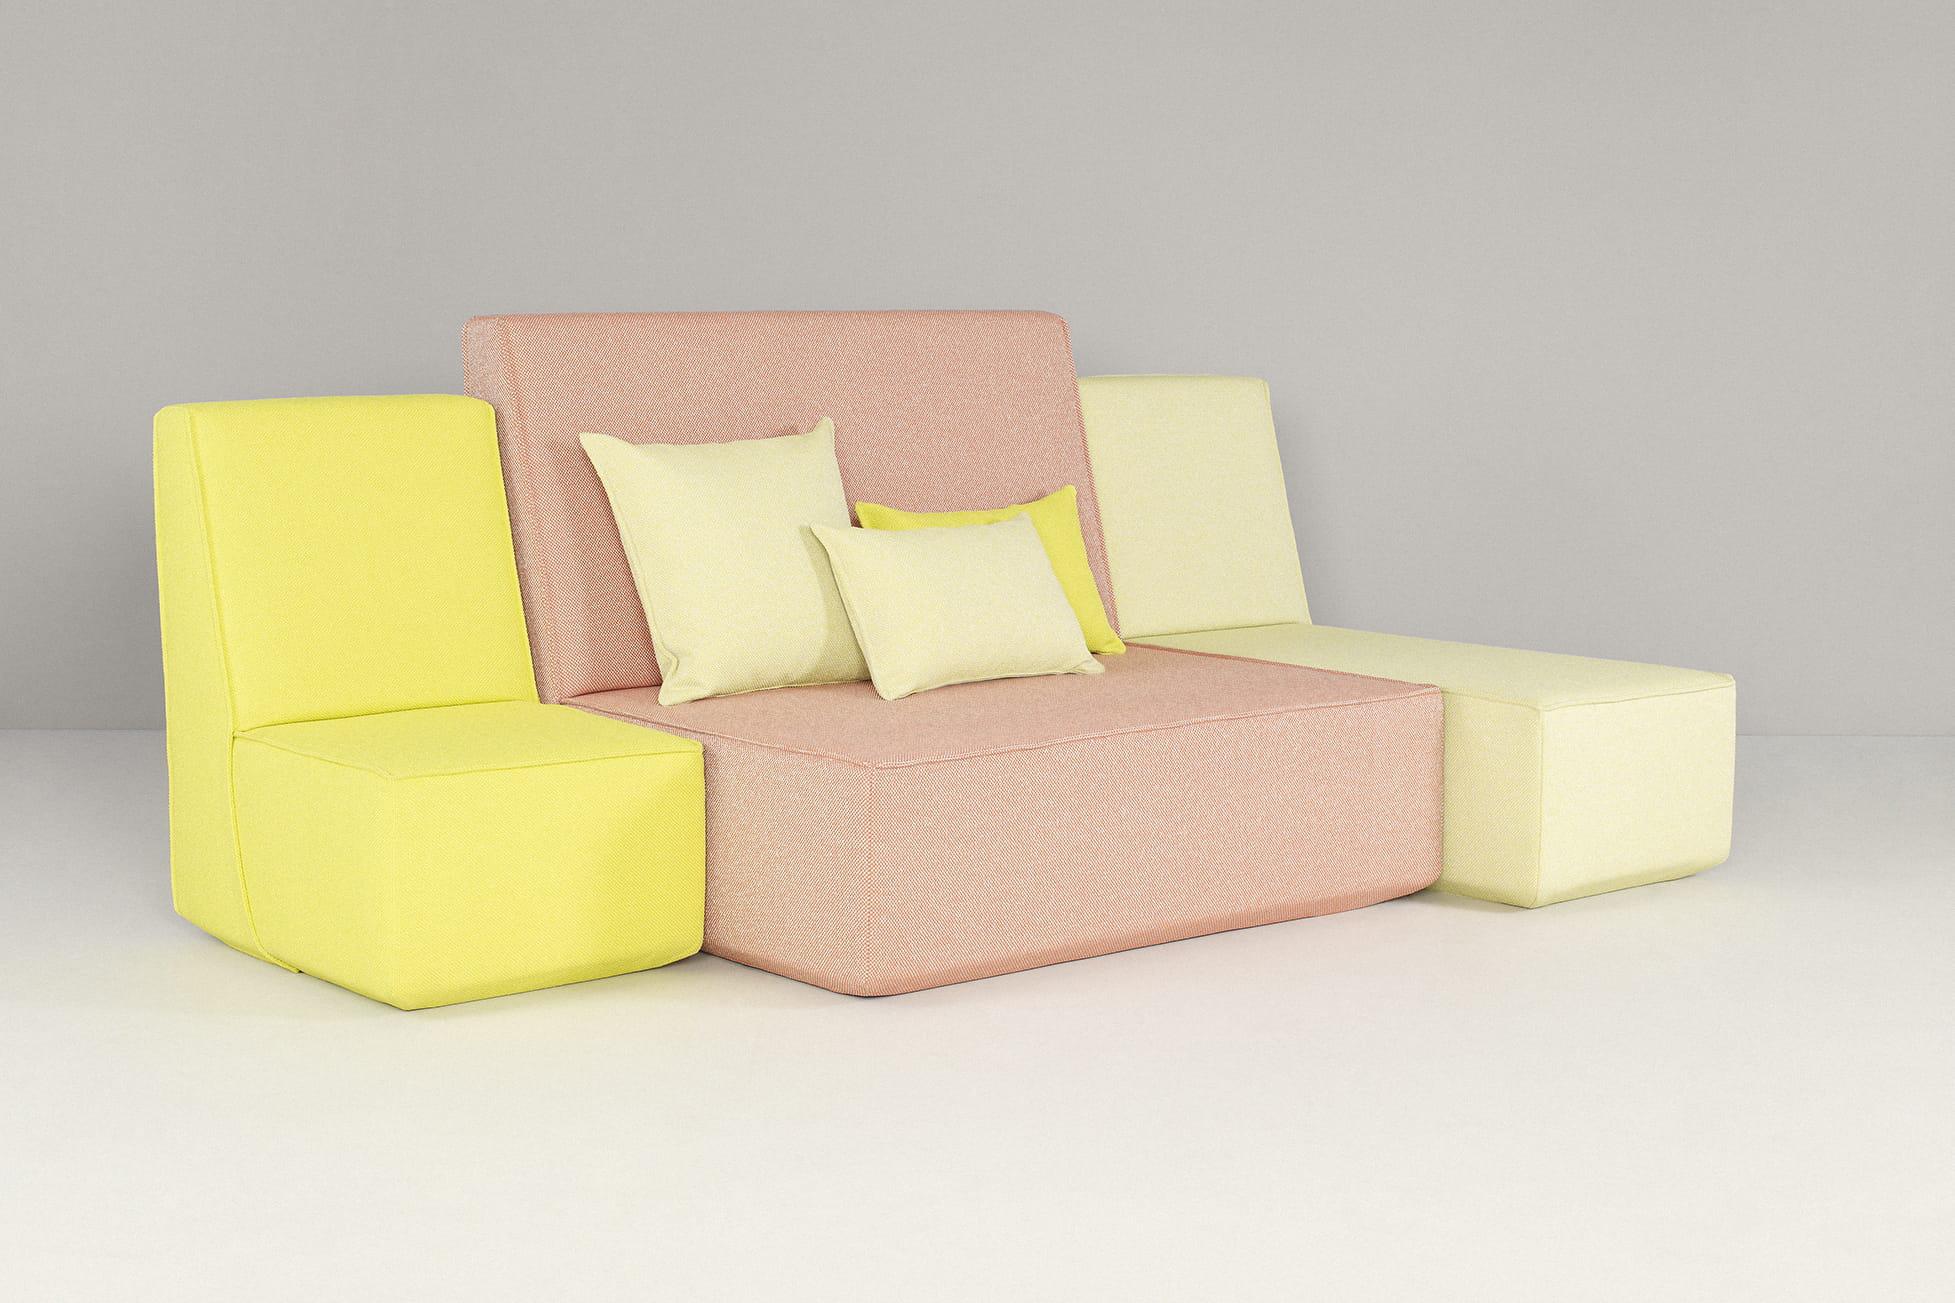 canap modulable cubit. Black Bedroom Furniture Sets. Home Design Ideas